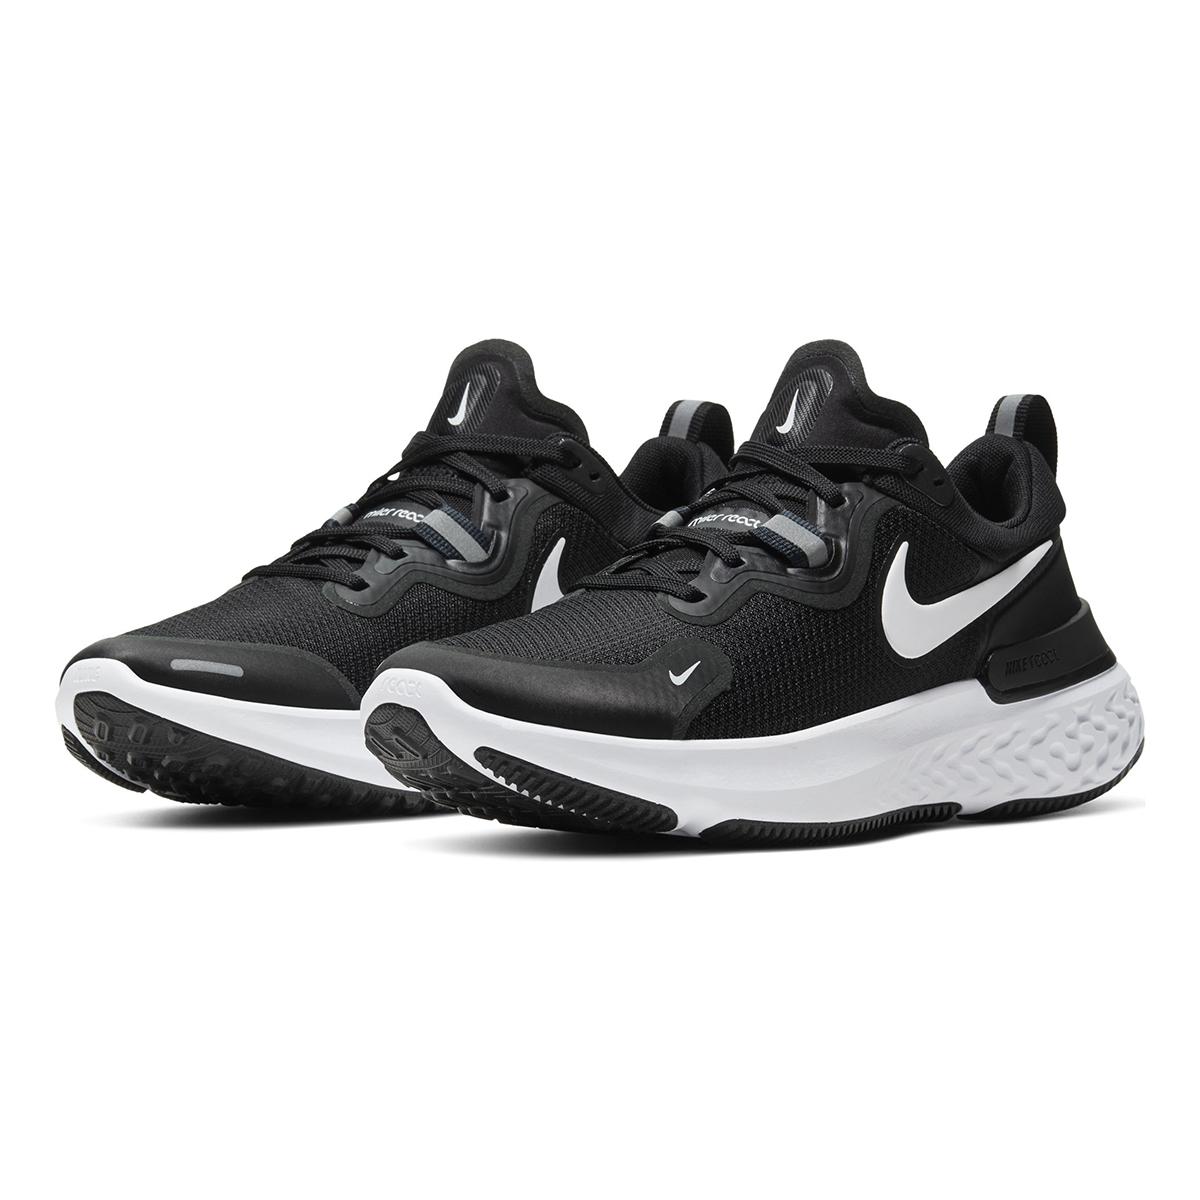 Women's Nike React Miler Running Shoe - Color: Black/Dark Grey/Anthracite/White (Regular Width) - Size: 5, Black/Dark Grey/Anthracite/White, large, image 4